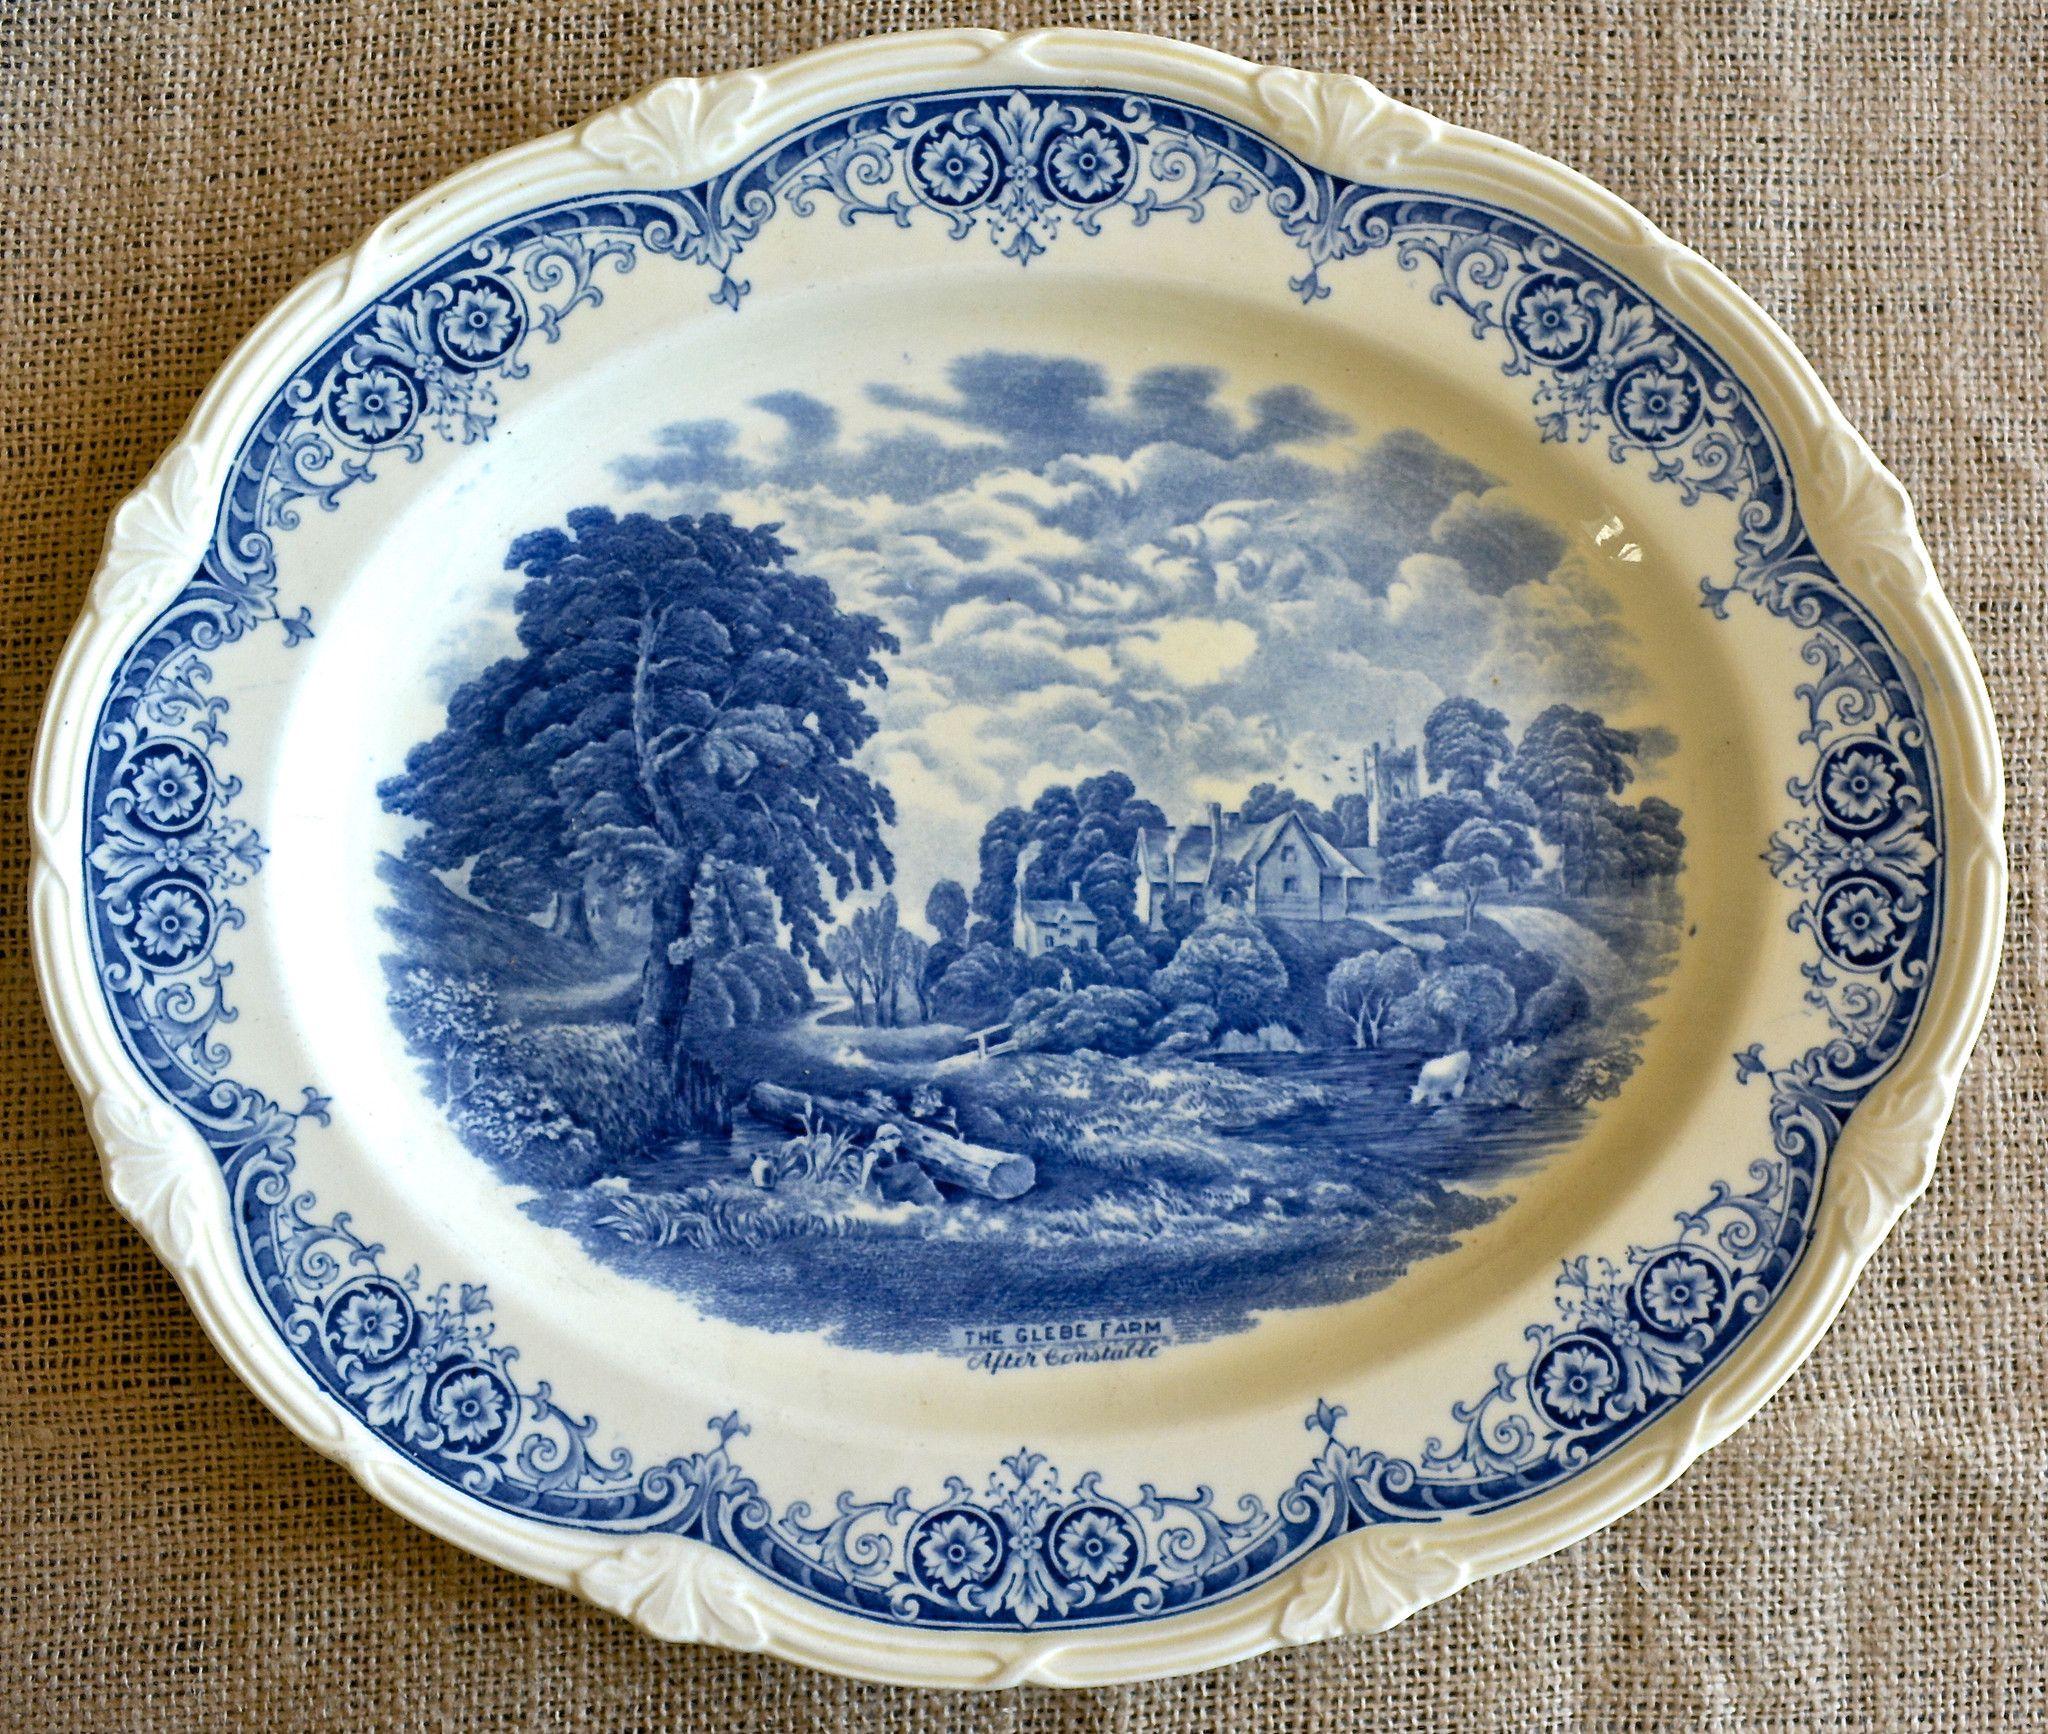 Blue Transferware Scenes After Constable English Creamware Platter Con